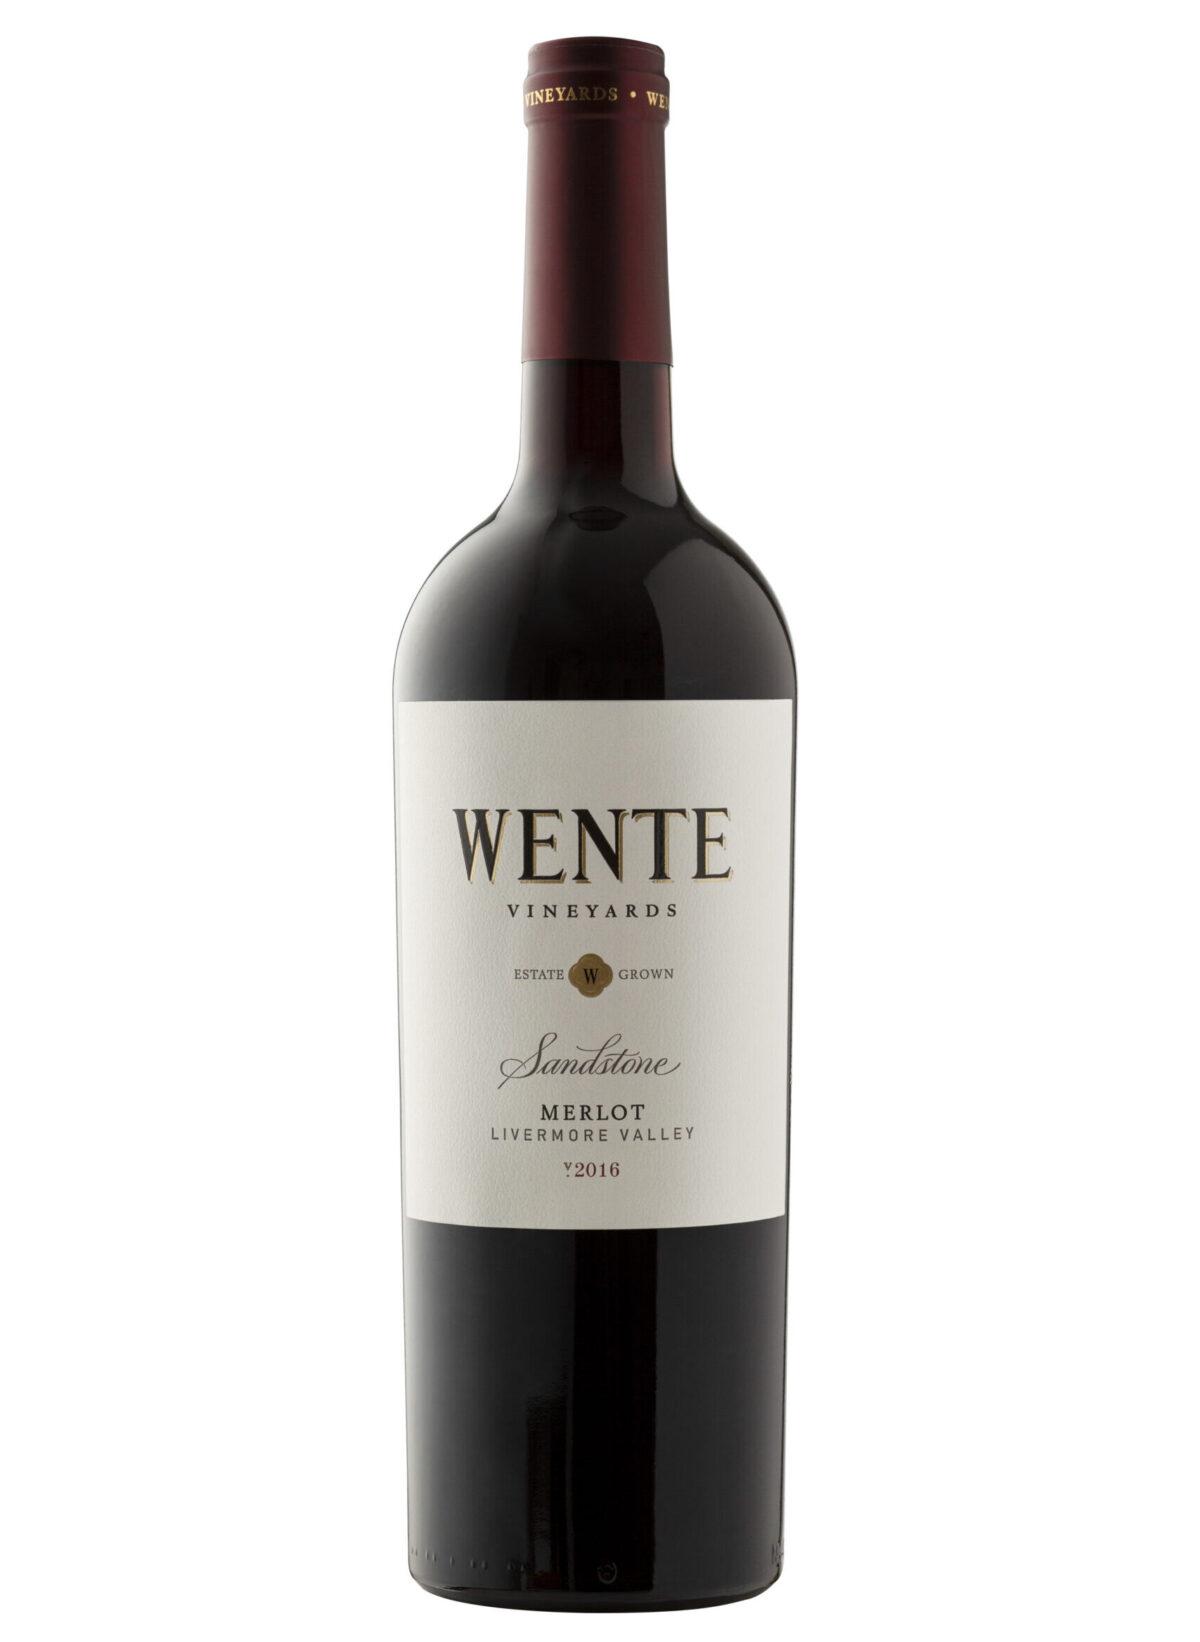 Wente Vineyards Sandstone Merlot